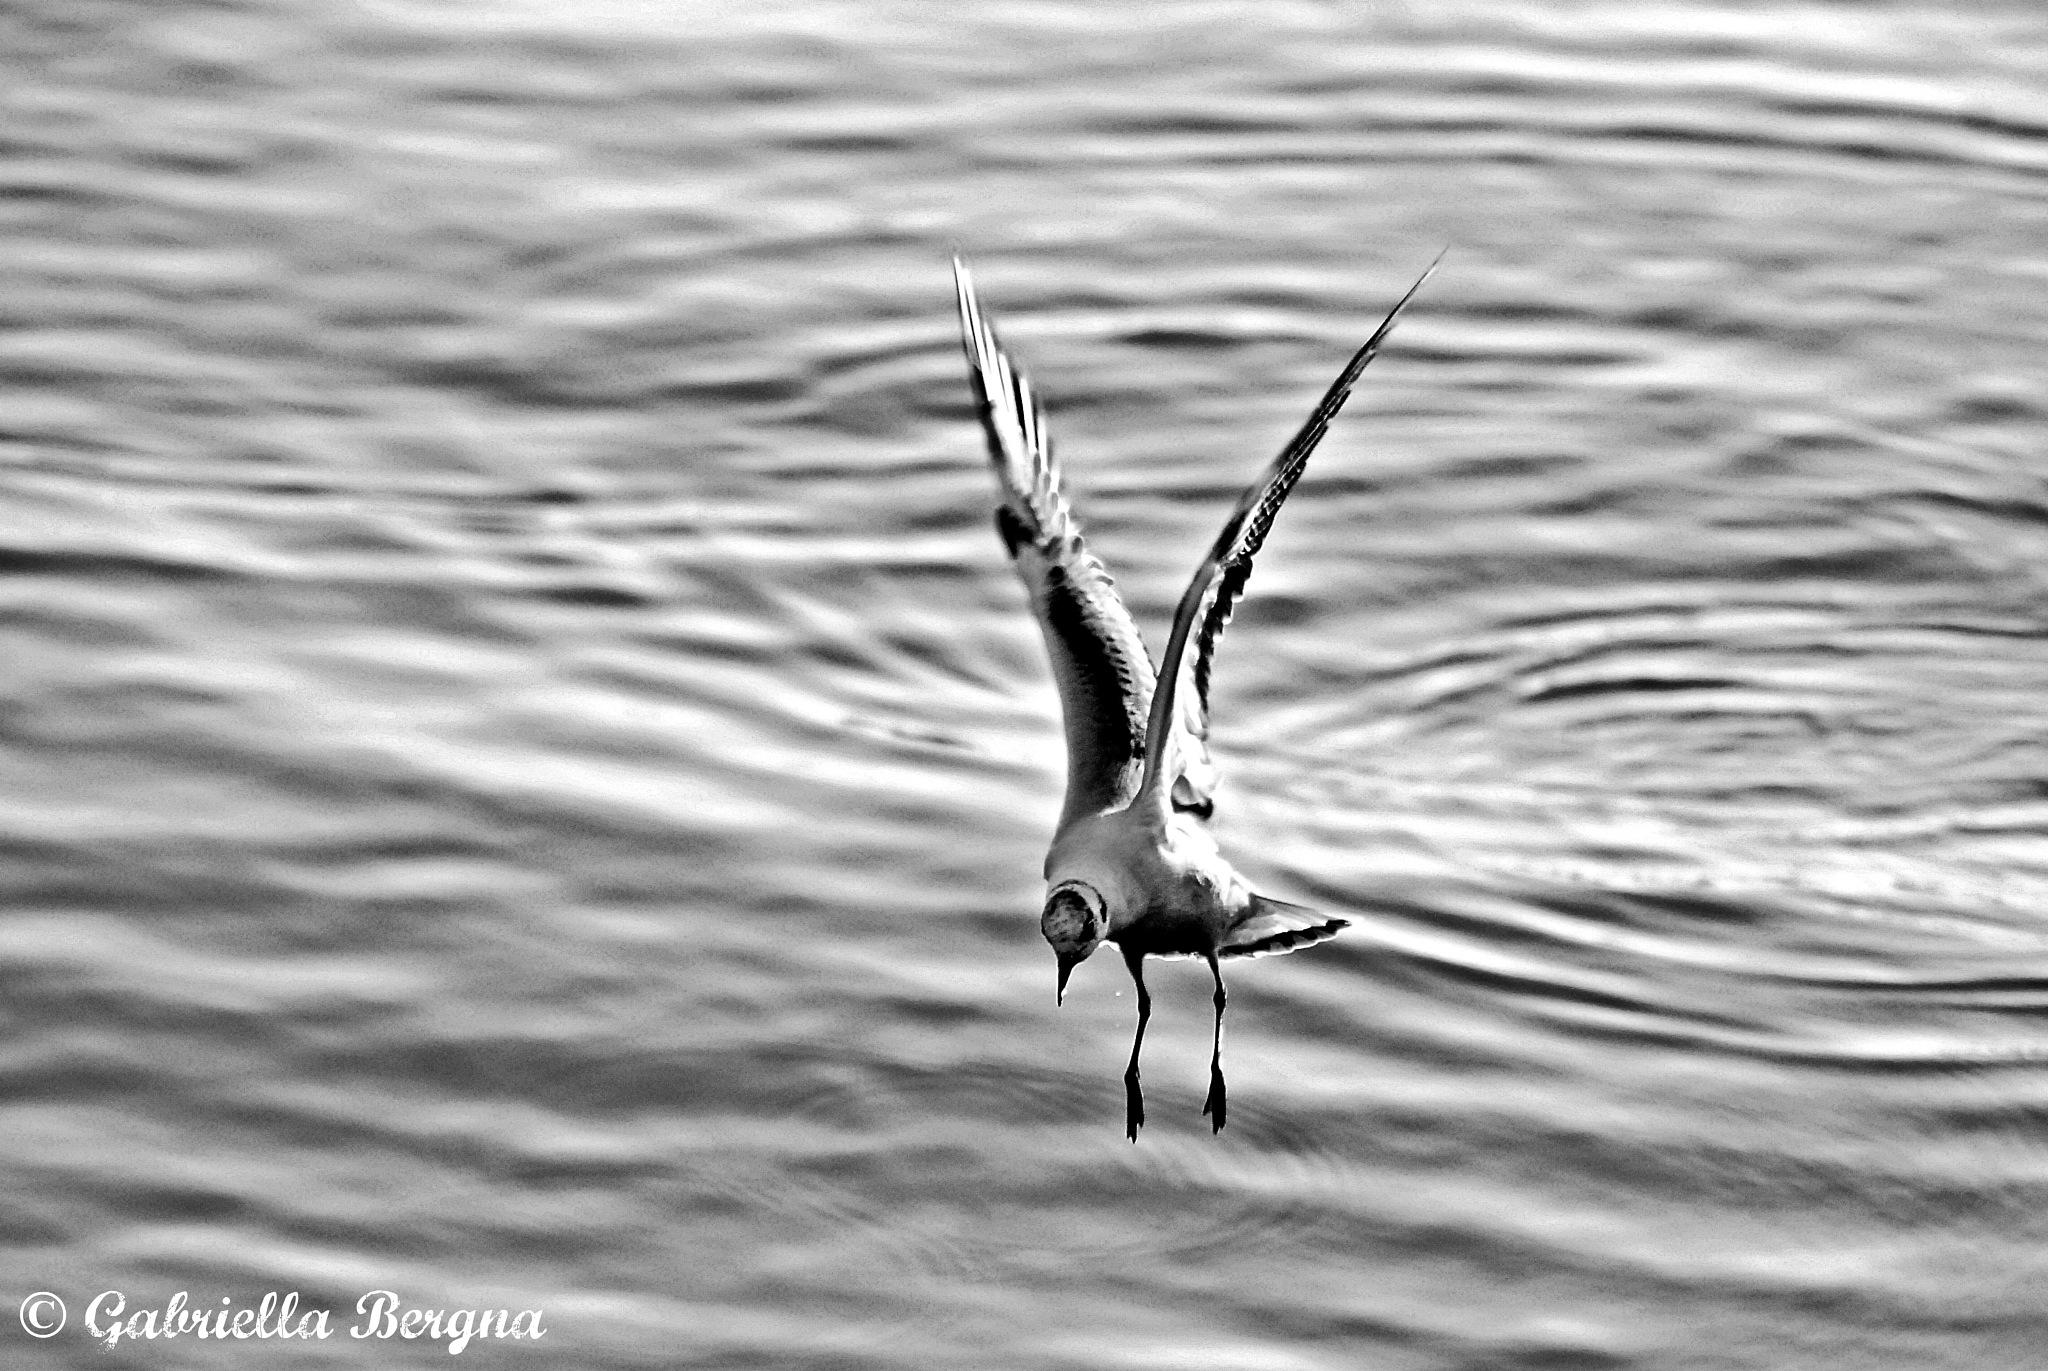 Seagulls by Gabriella Bergna